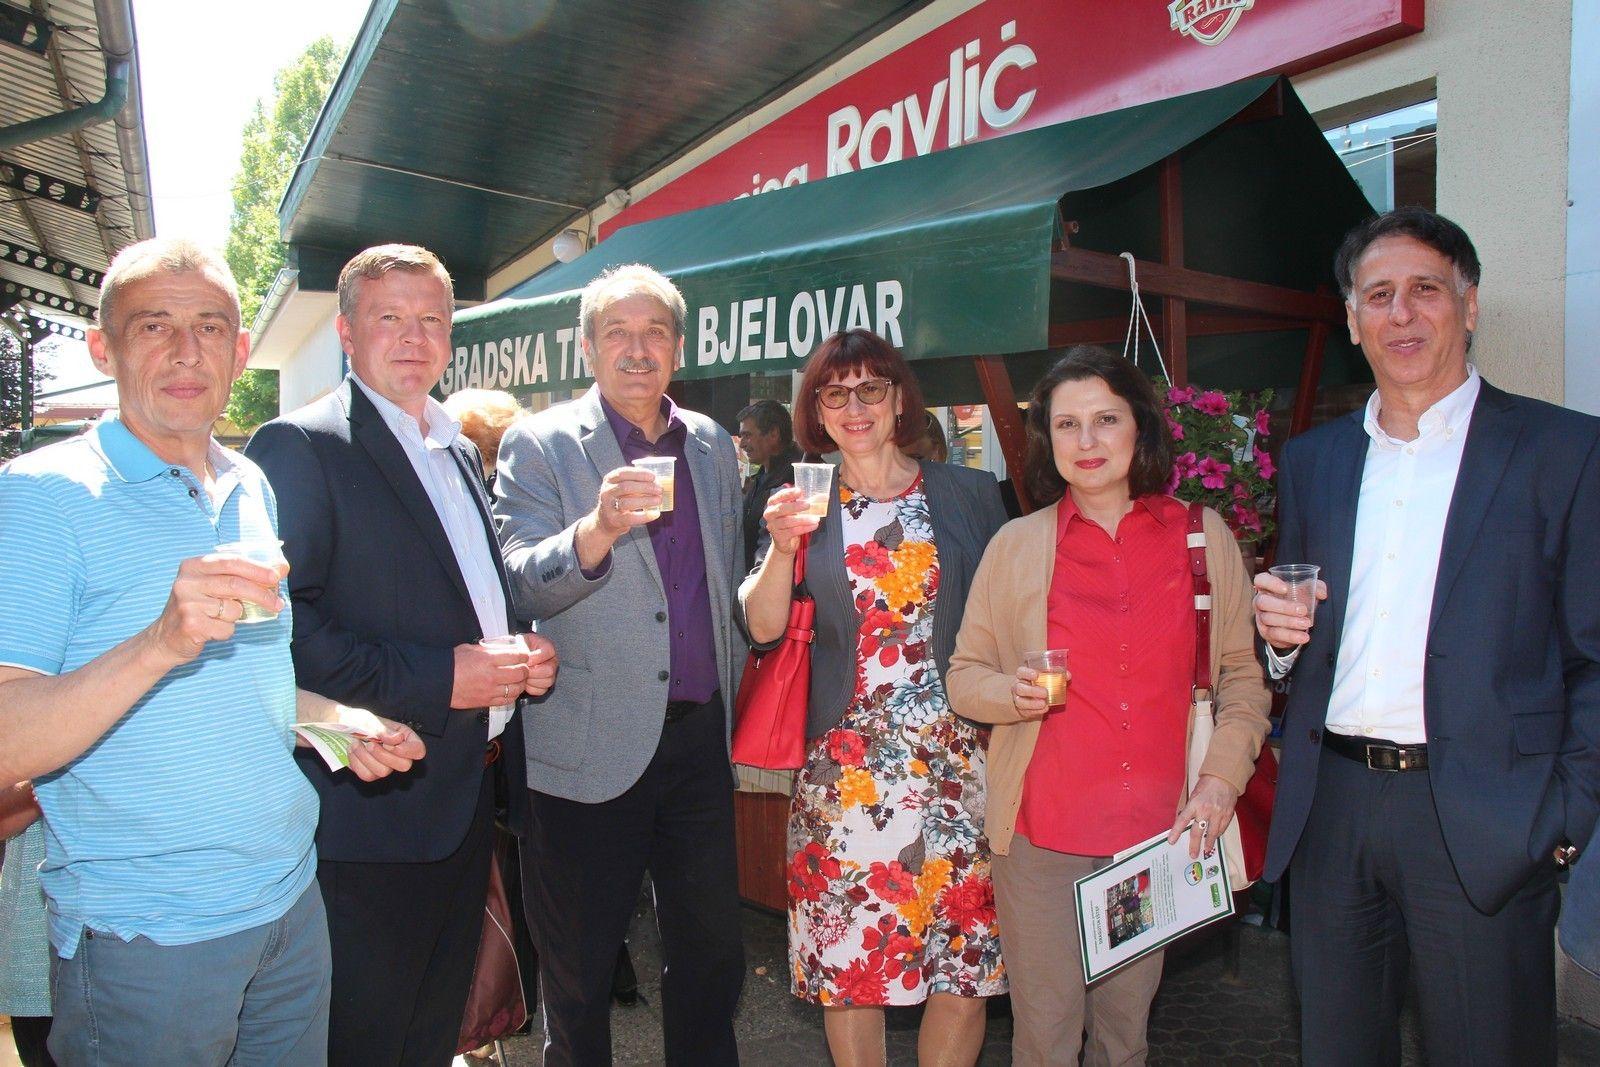 2017 5 bjelovar 2017 23